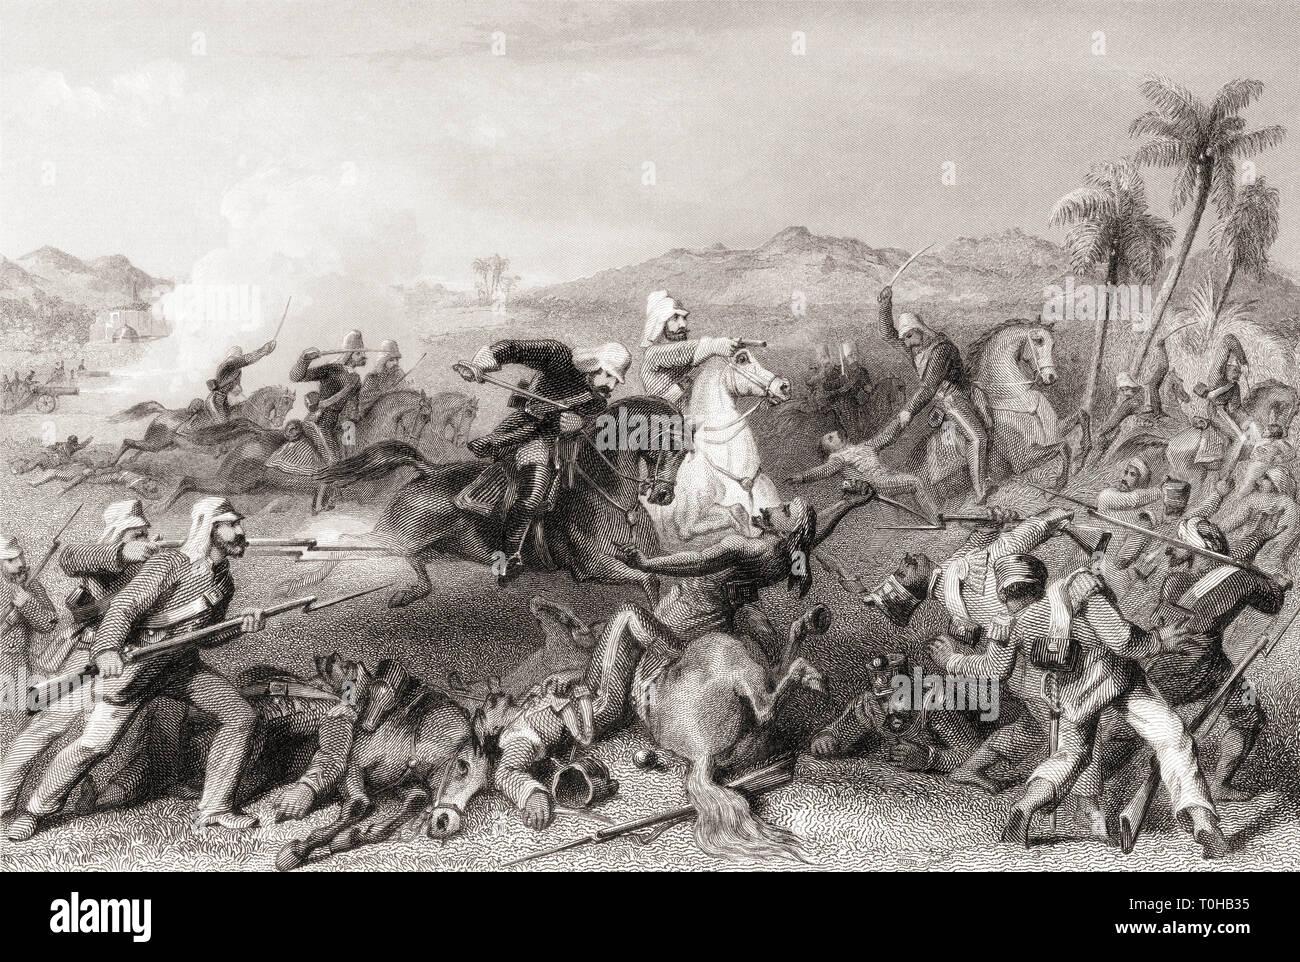 Attack on Sealkote mutineers by General Nicholson's irregular cavalry, India, Asia, 1857 Stock Photo